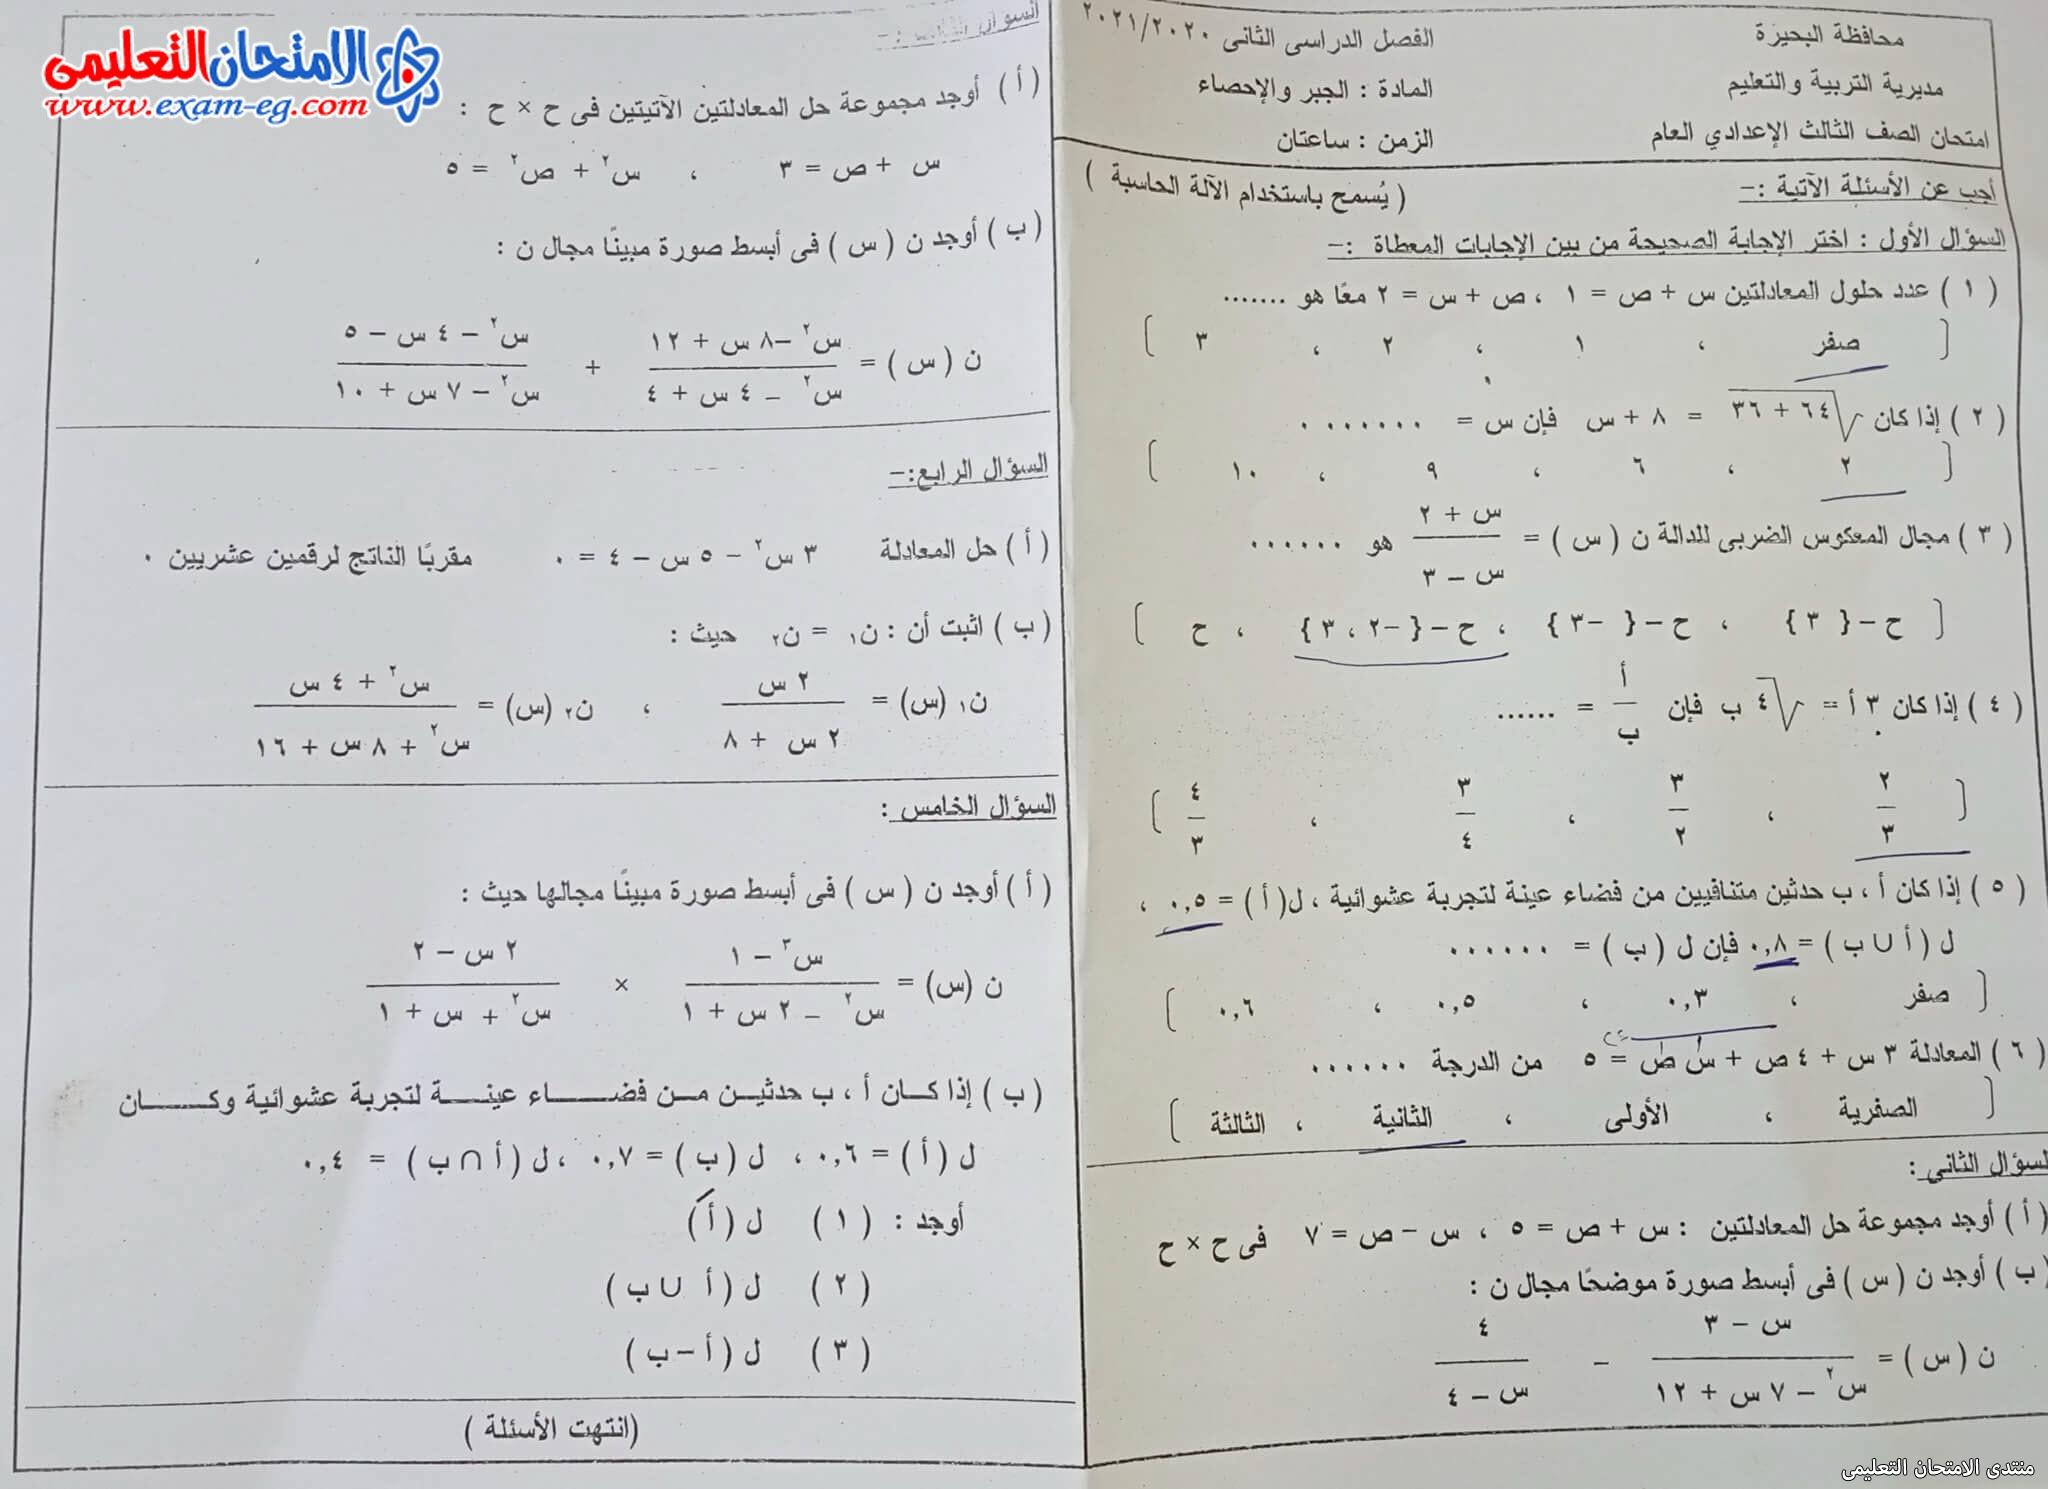 exam-eg.com_162300969287721.jpg